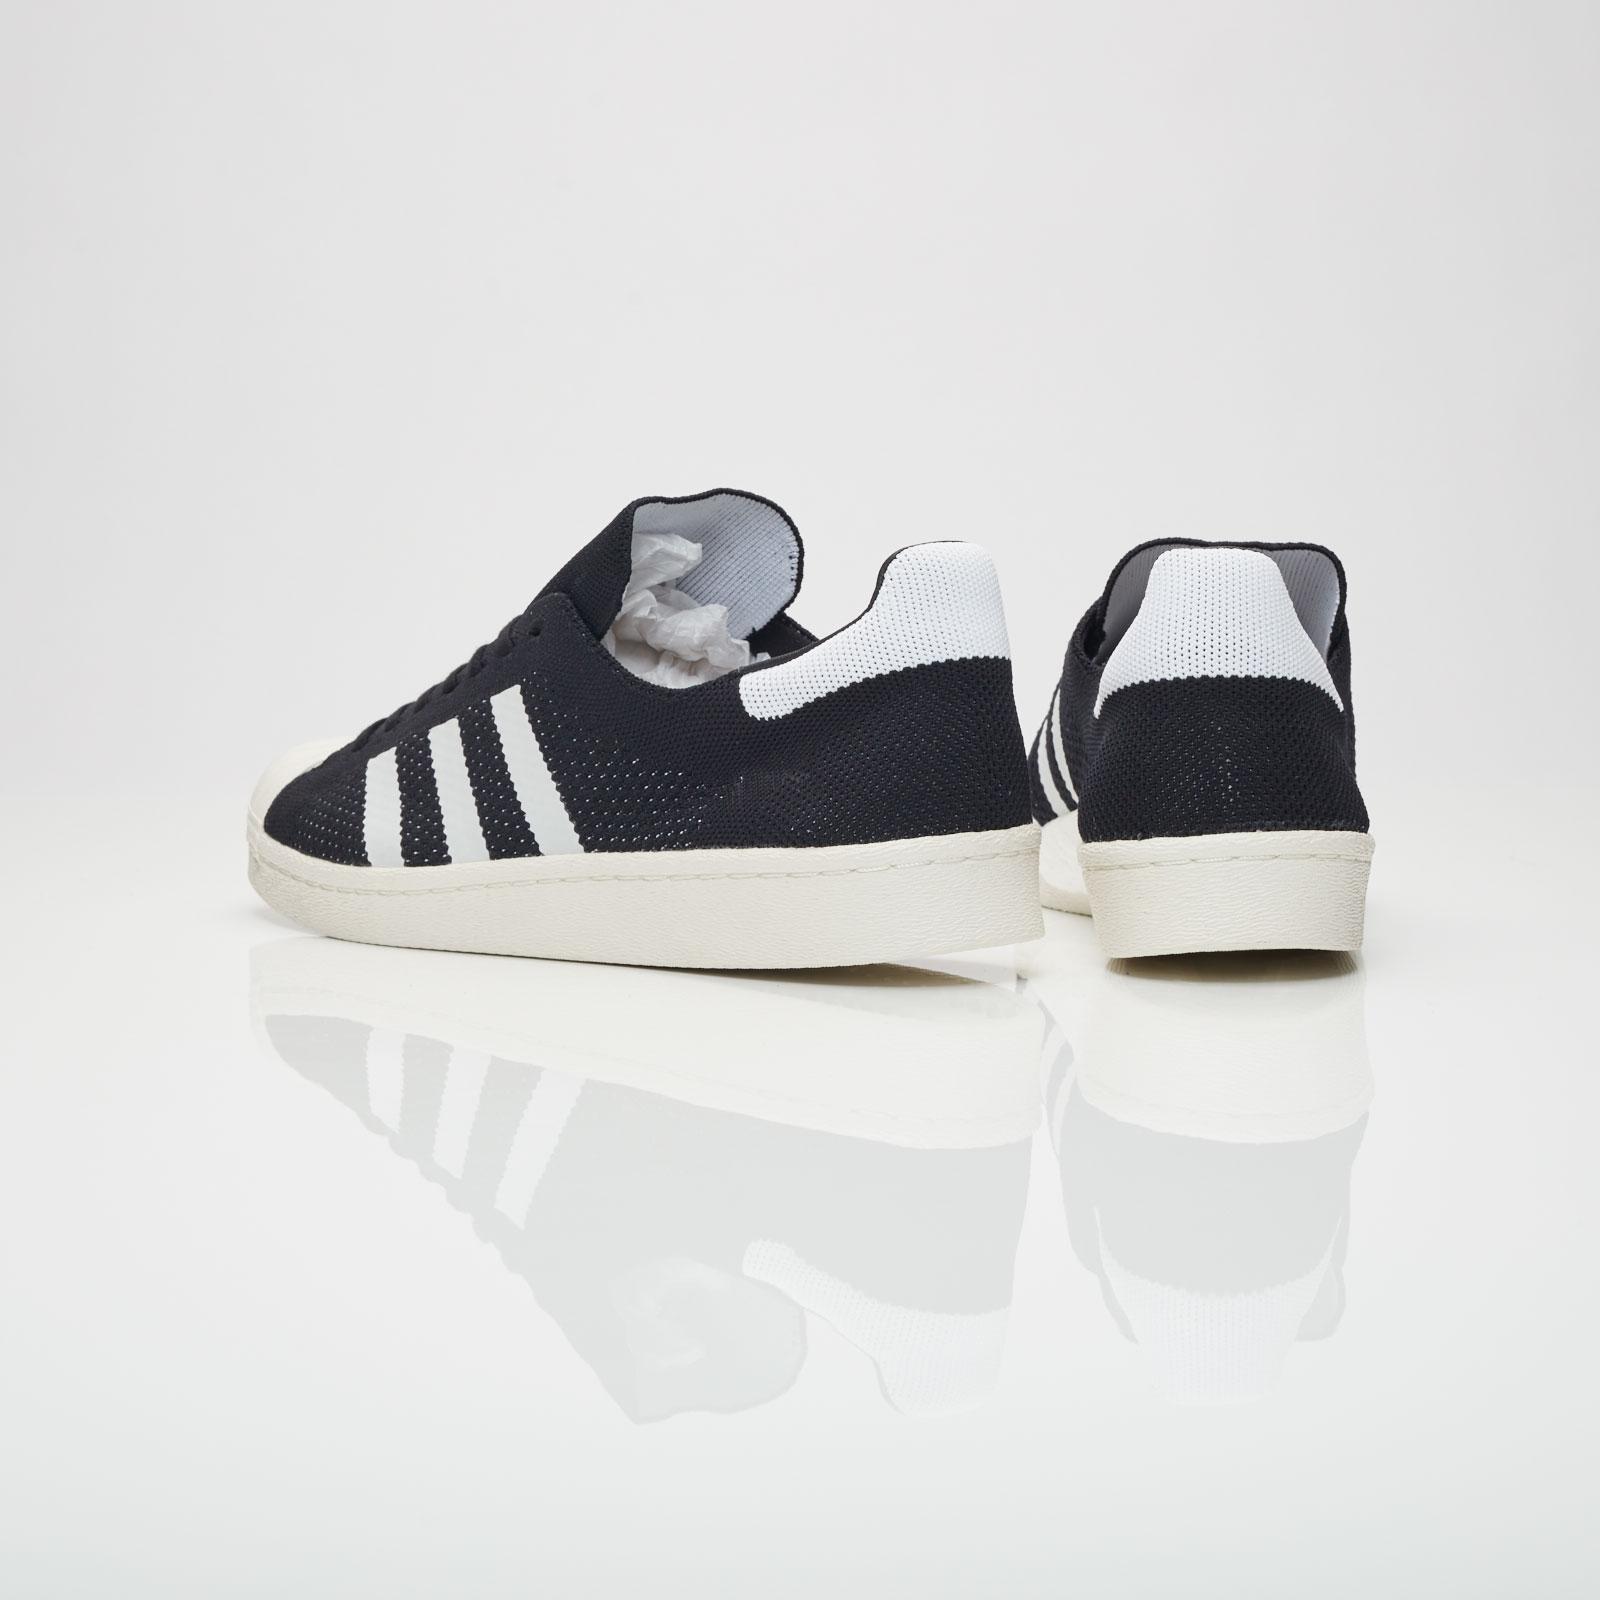 lowest price e99d9 cec7d adidas Superstar Boost Pk - Bb0191 - Sneakersnstuff ...